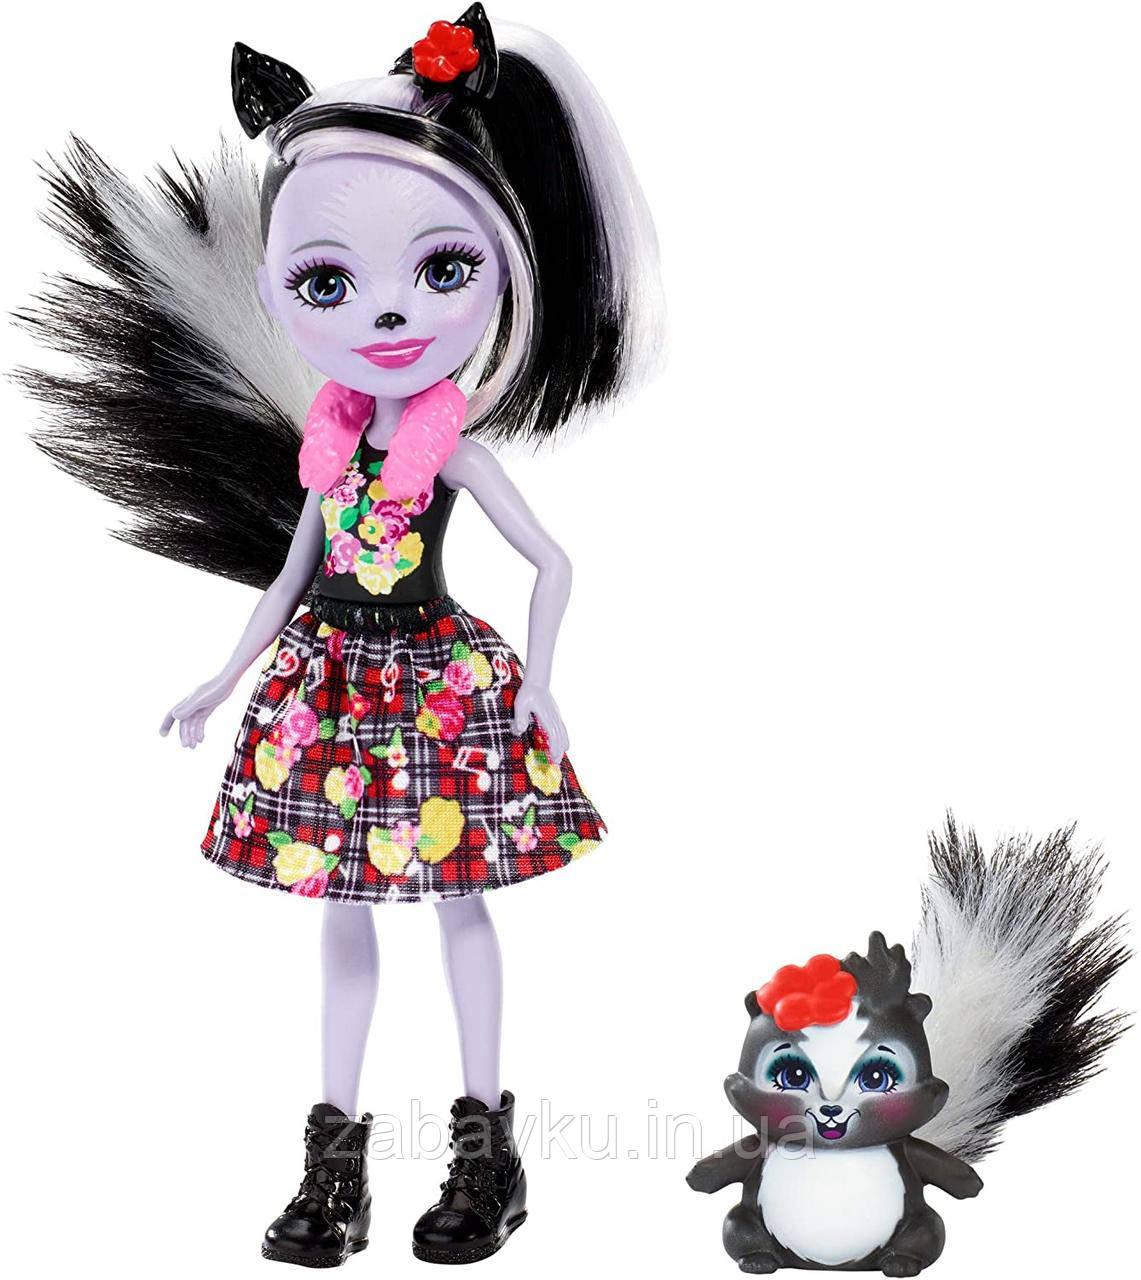 Enchantimals Sage Skunk Doll Кукла энчантималс Сейдж Скунс